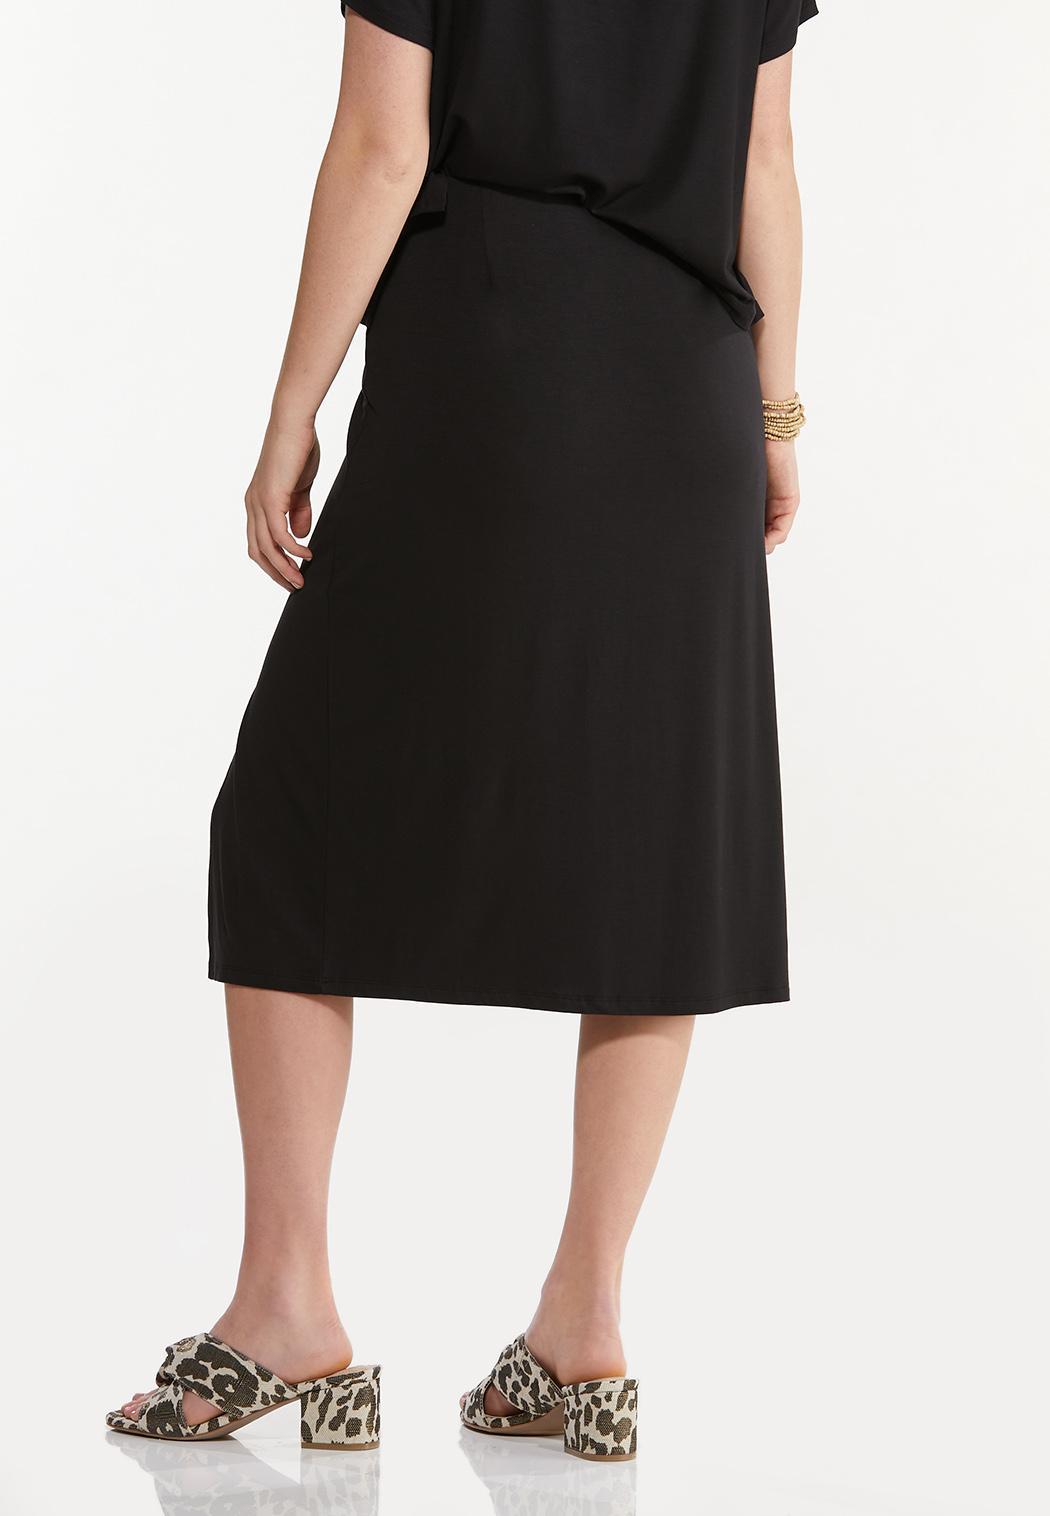 Plus Size Black Front Slit Skirt (Item #44545671)